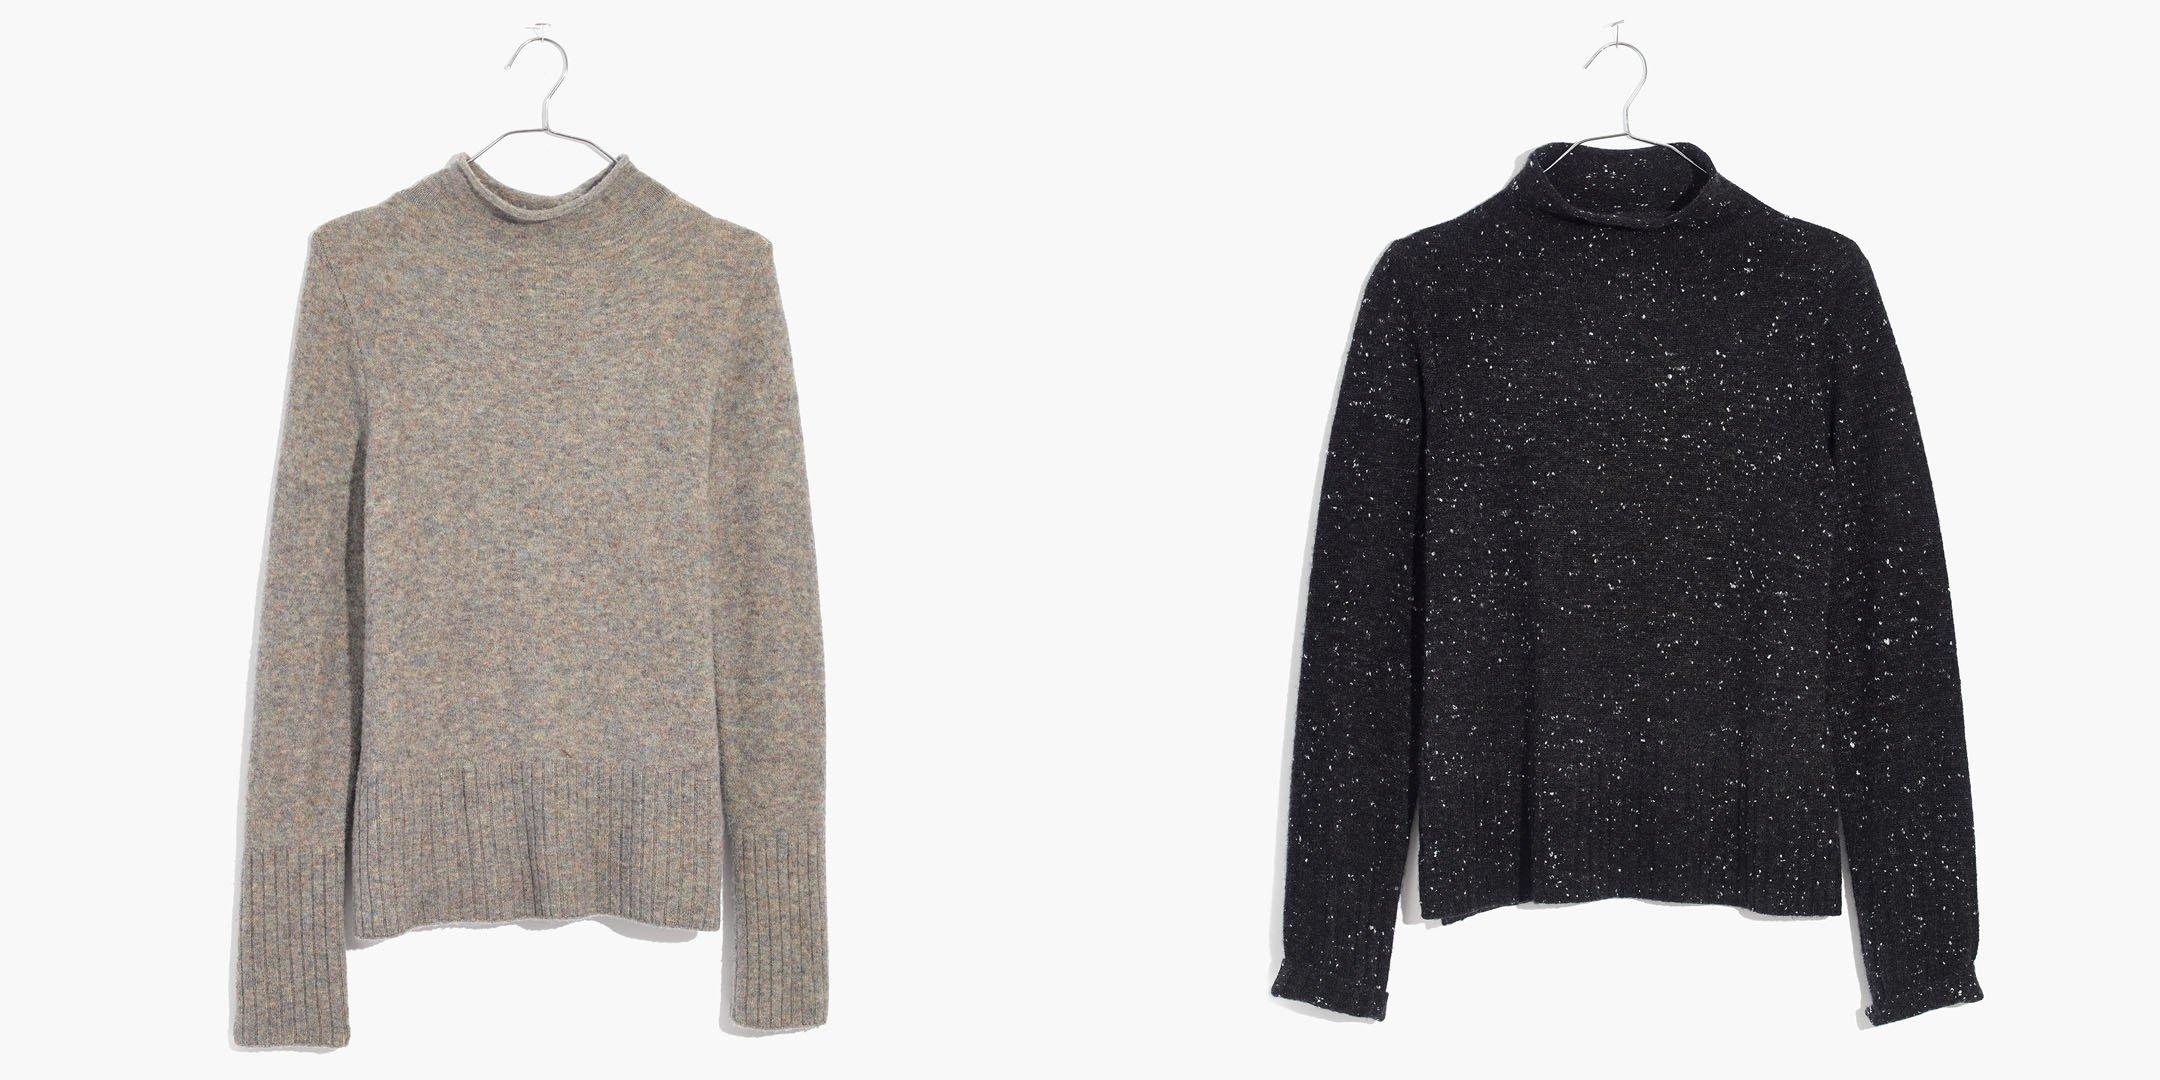 Madewell Inland Sweaters